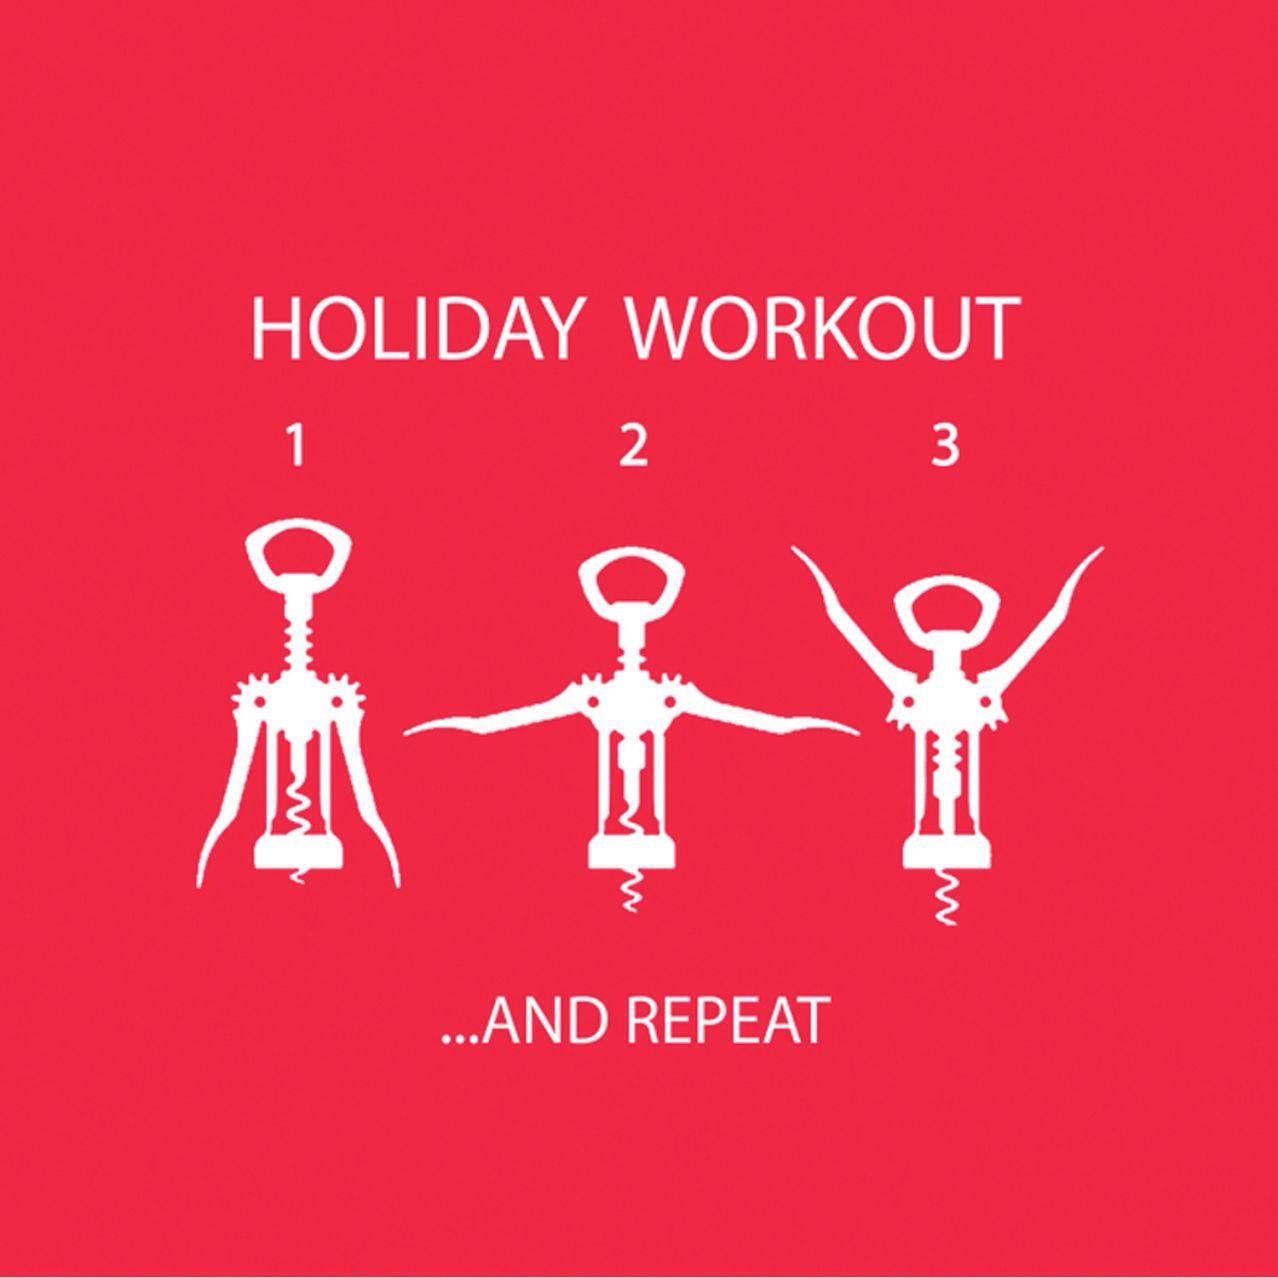 Holiday workout Holiday workout, Holiday